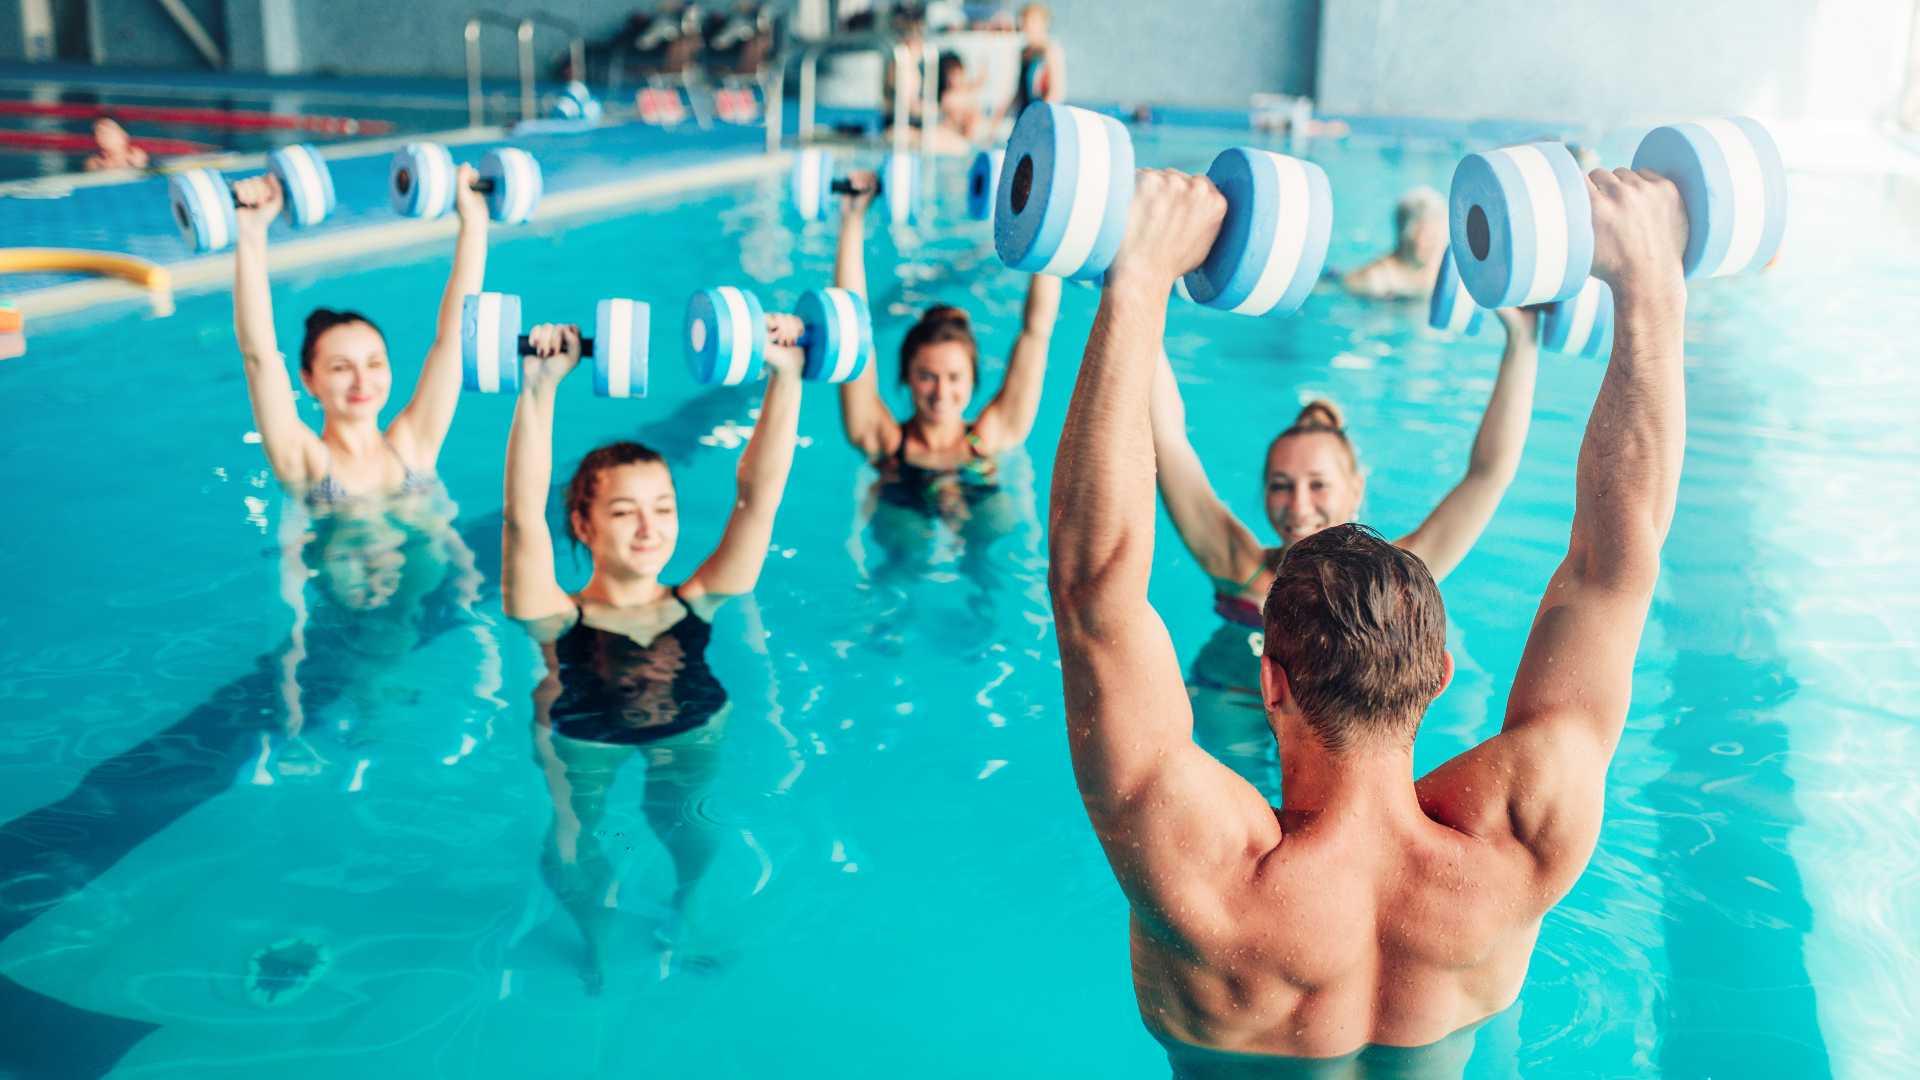 El aquafit, una de las ventajas de tener una piscina en casa